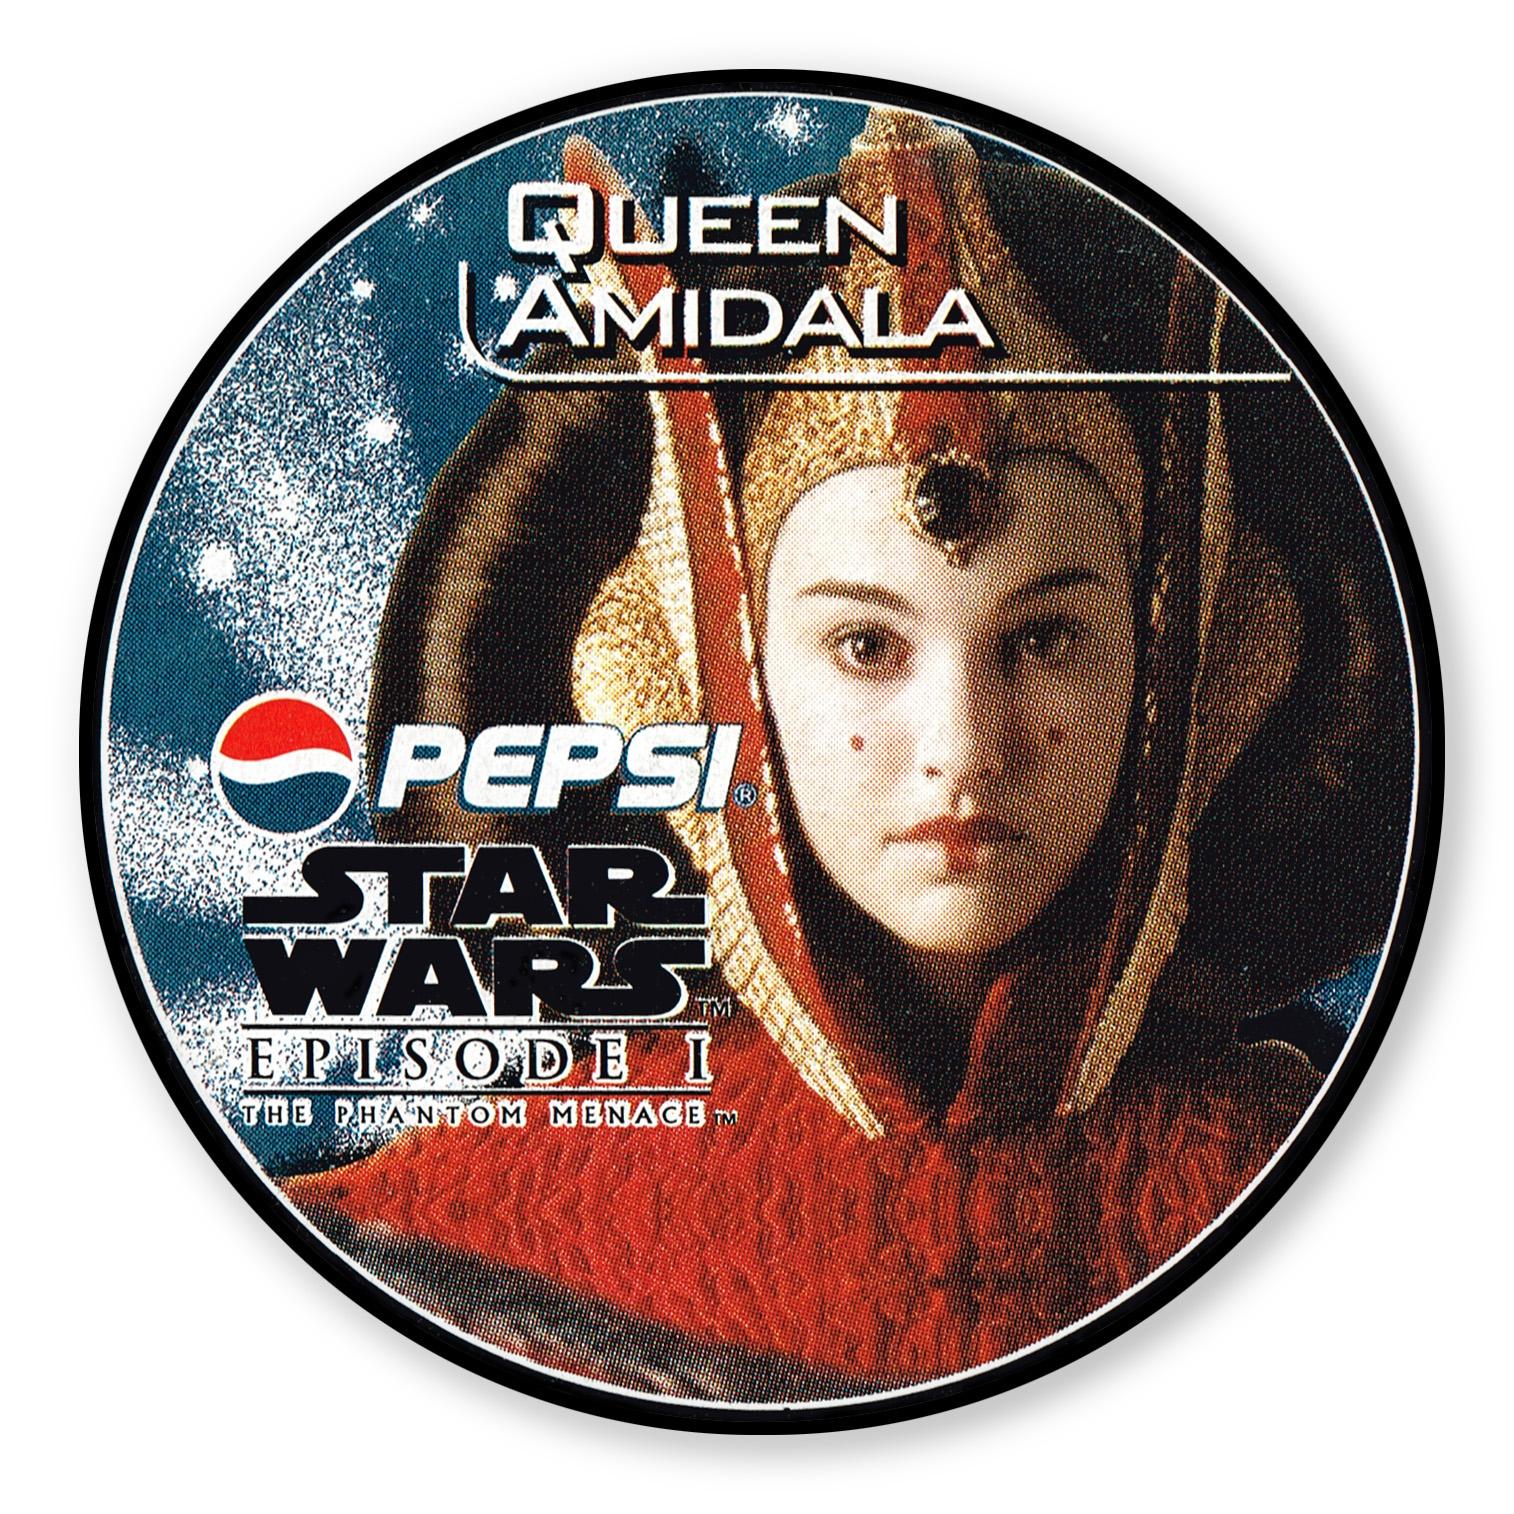 Queen Amidala Pepsi card (NZ, 1999)